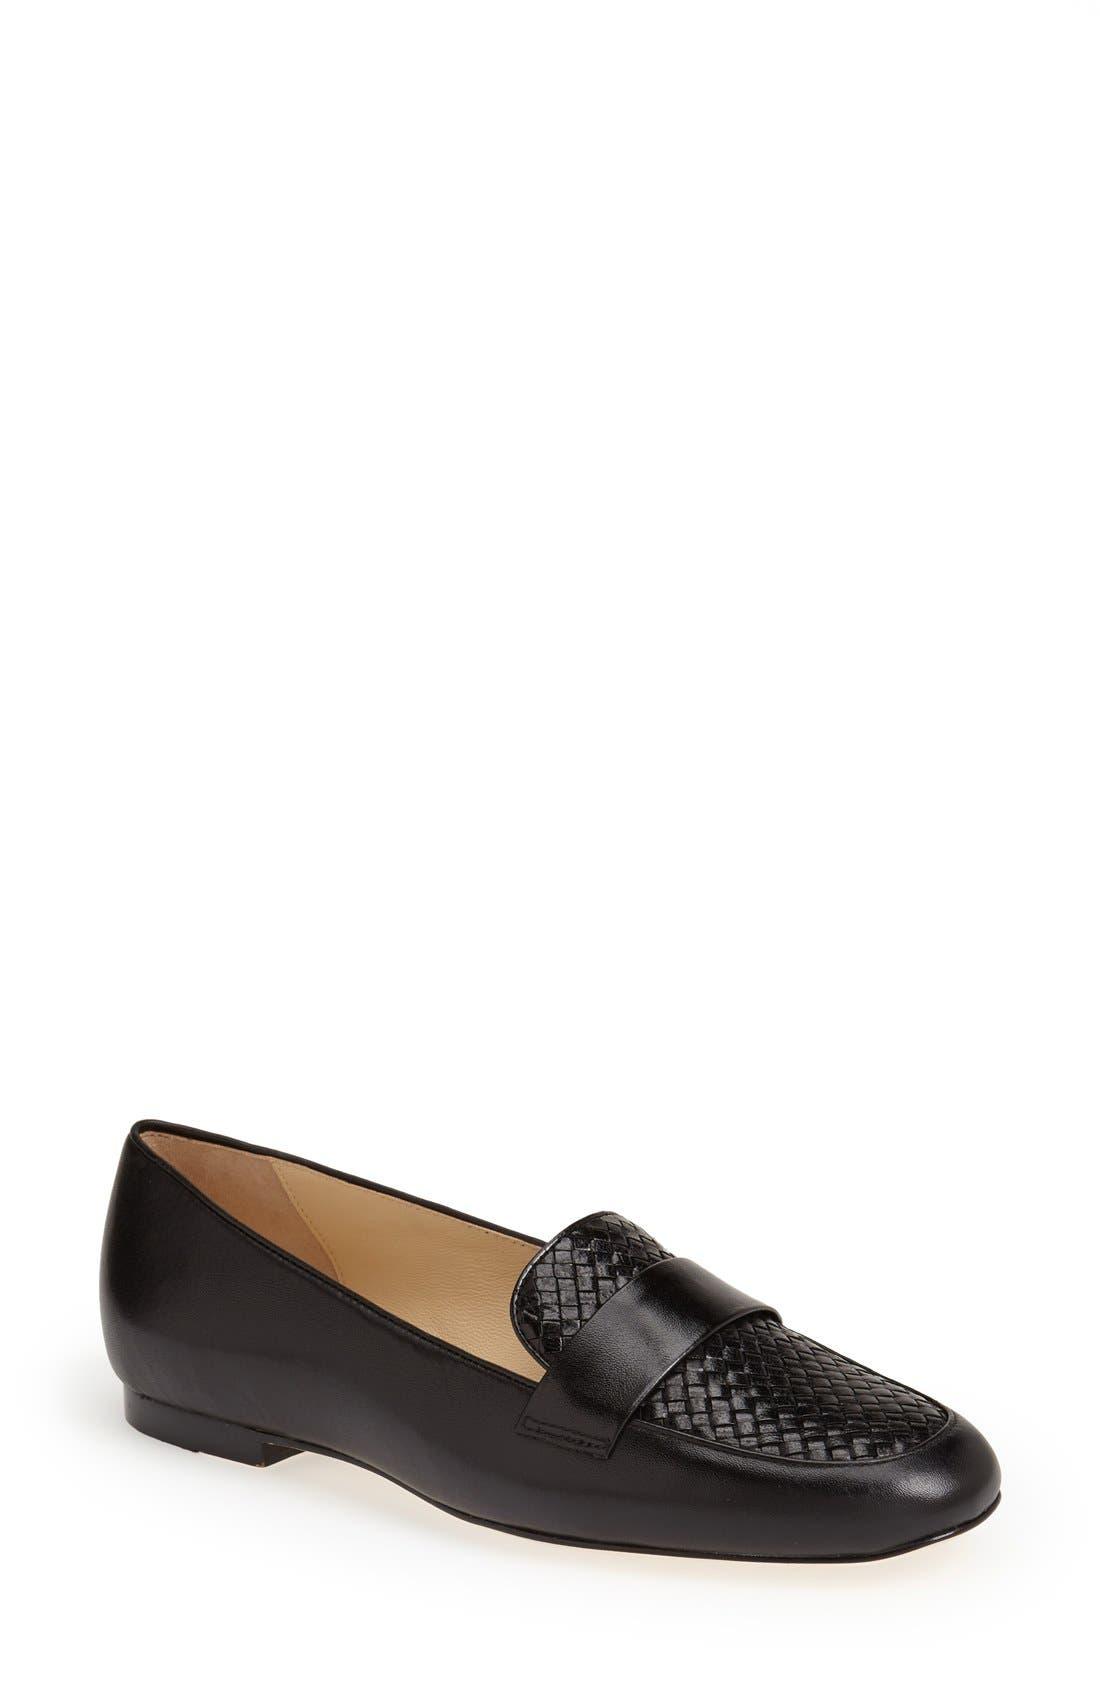 Main Image - Cole Haan 'Dakota' Woven Leather Loafer (Women)